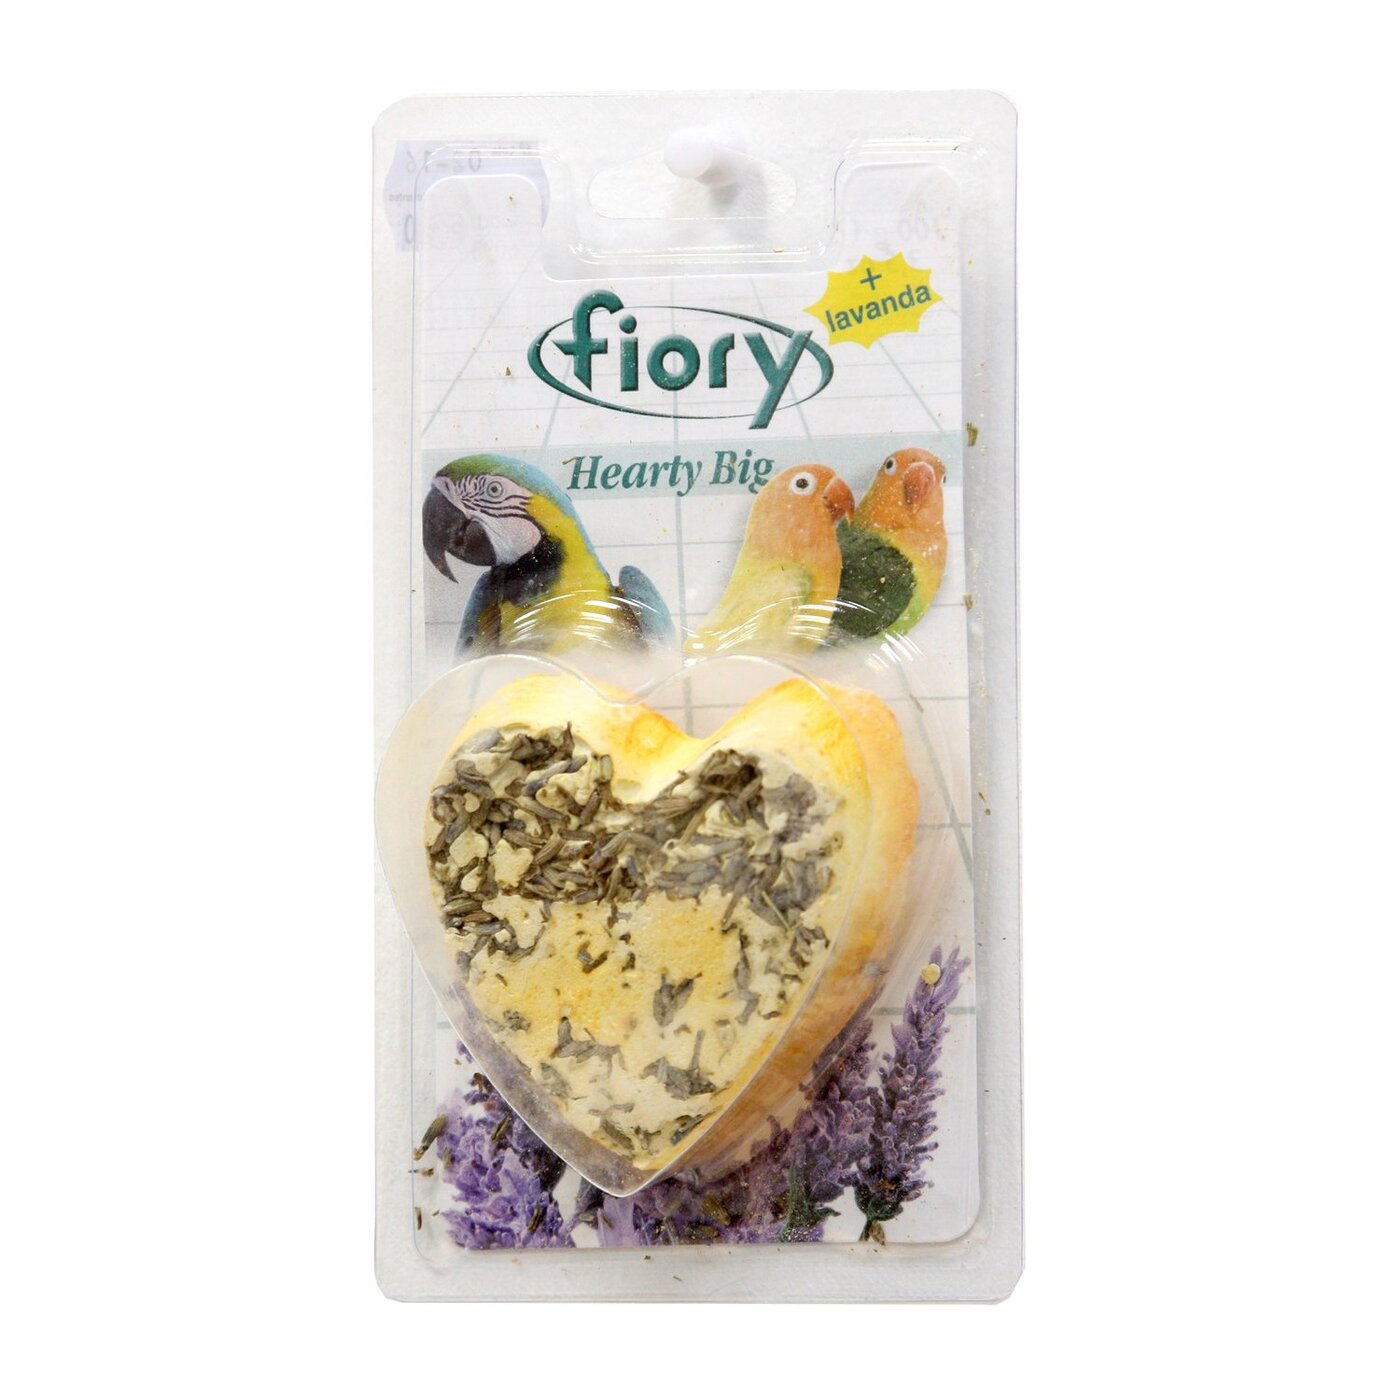 Fiory Hearty био-камень для птиц, с лавандой 100 гр